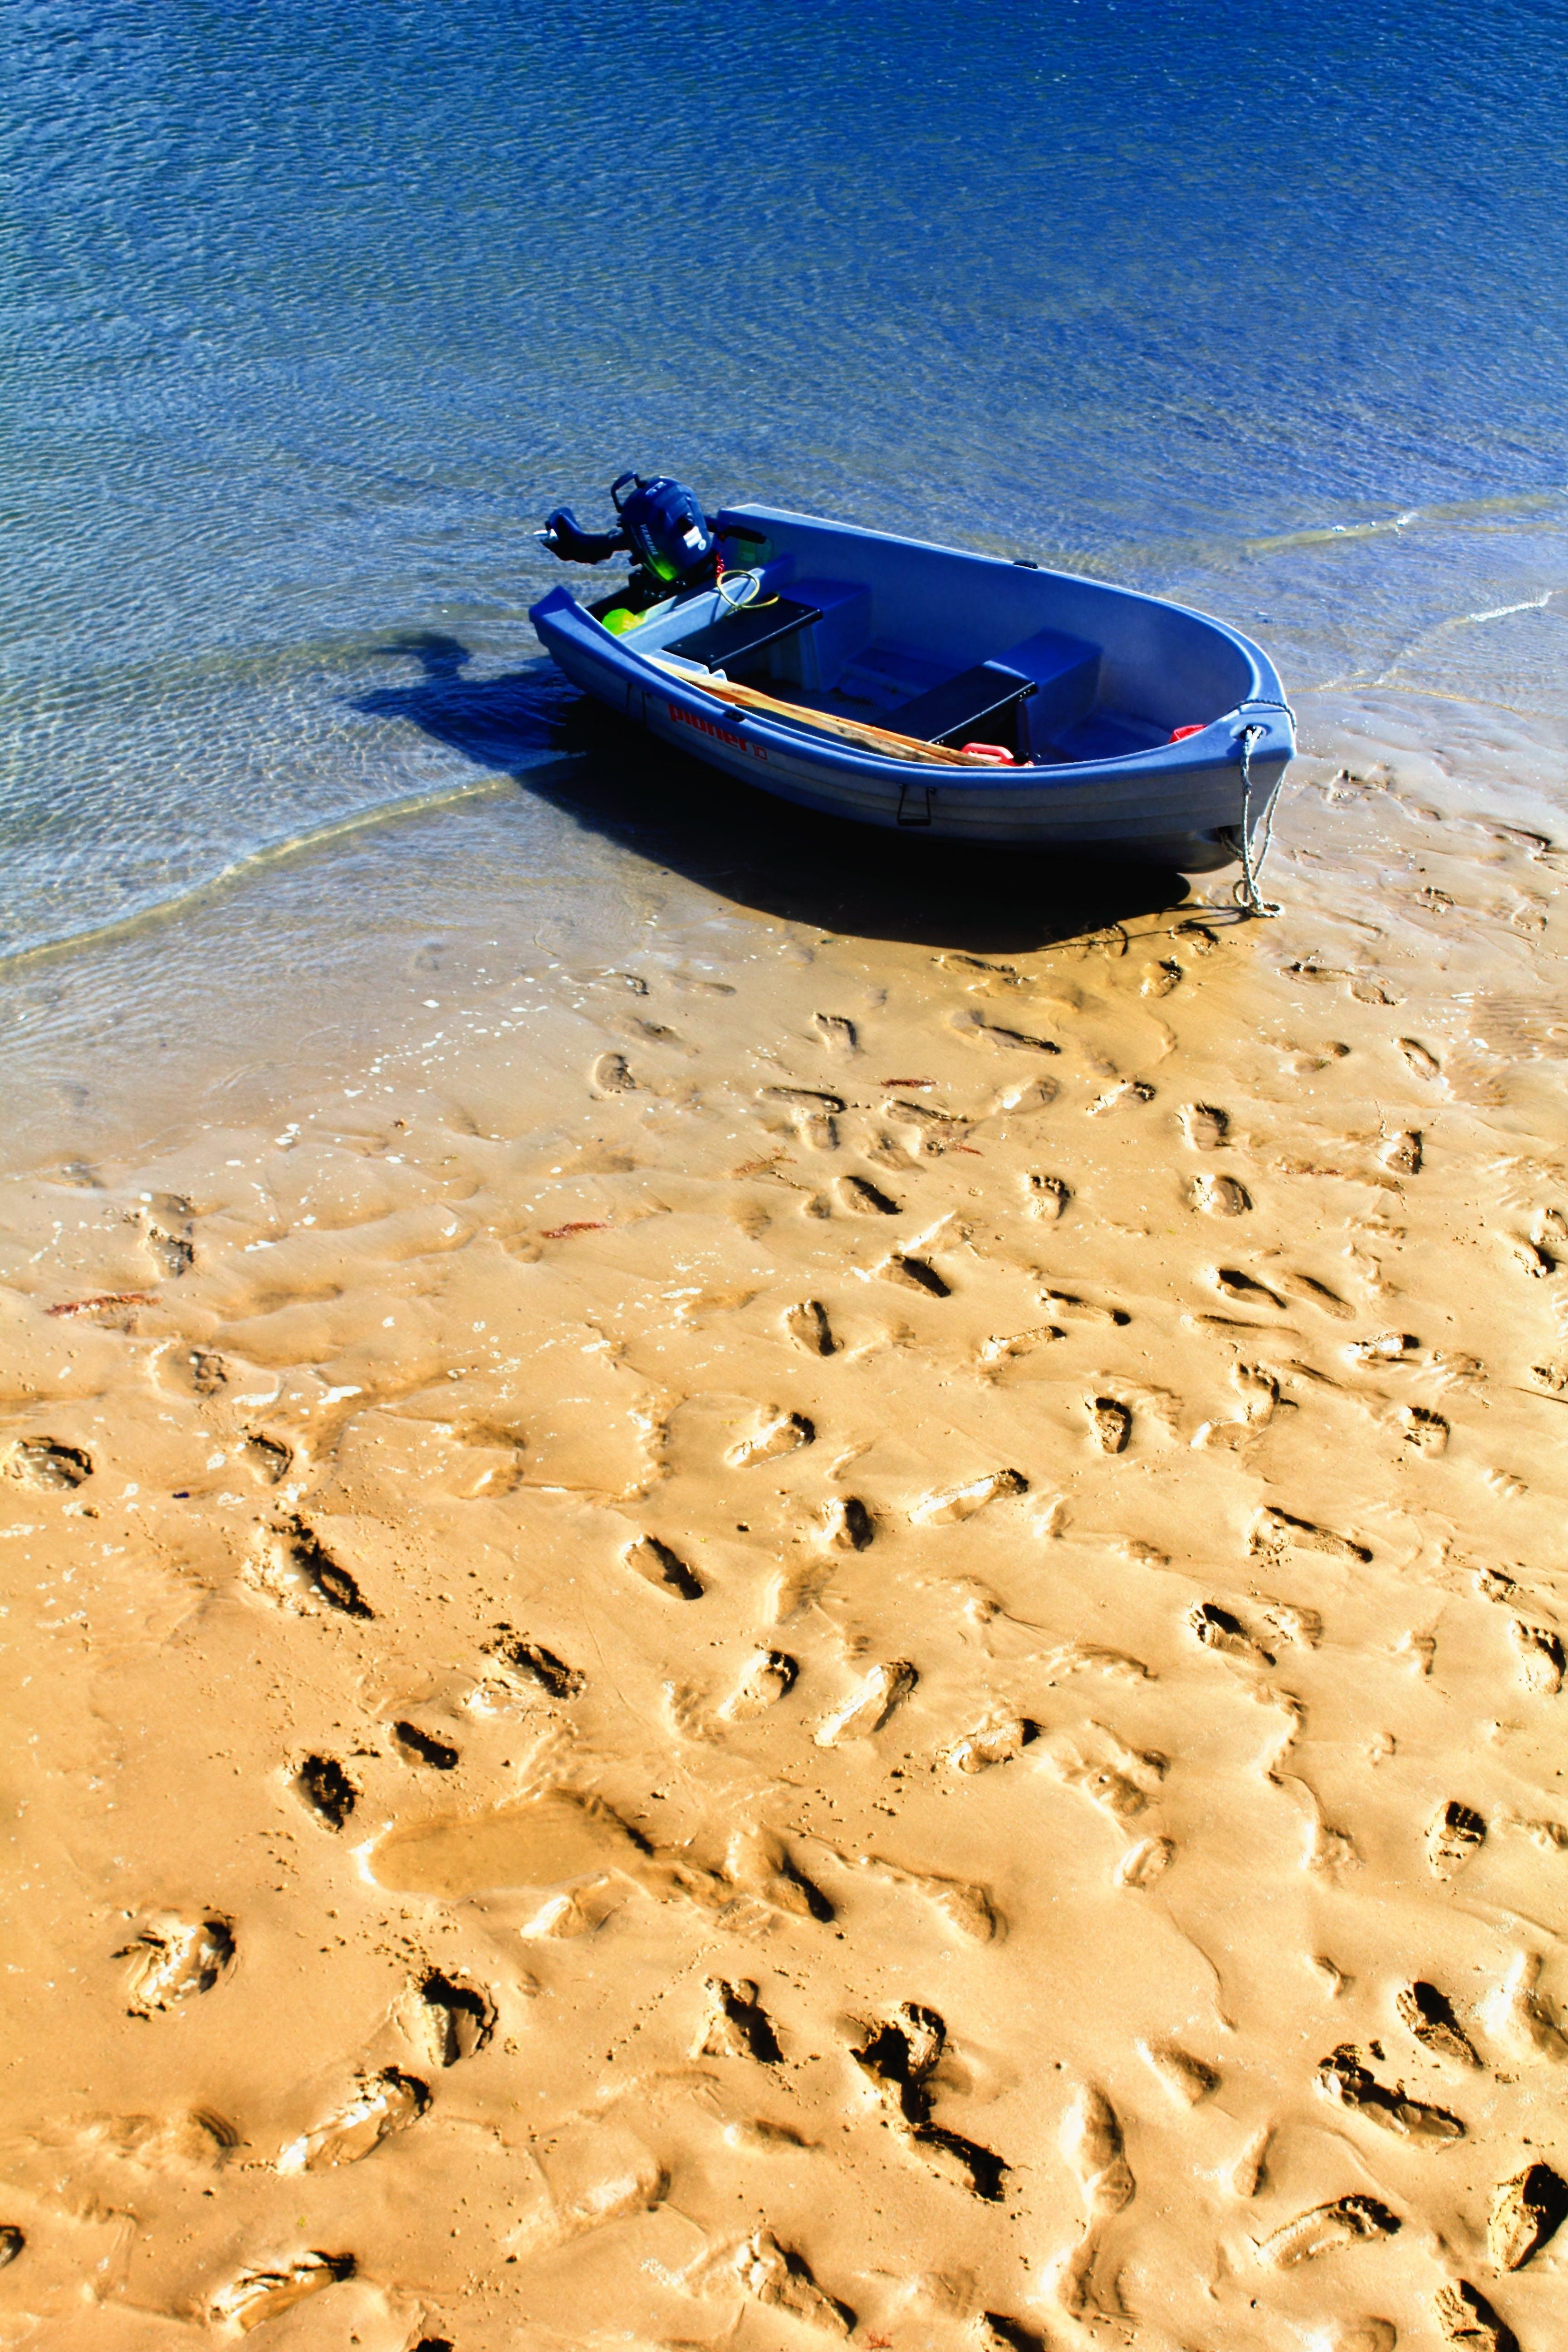 Blue Outboard Boat on Seashore